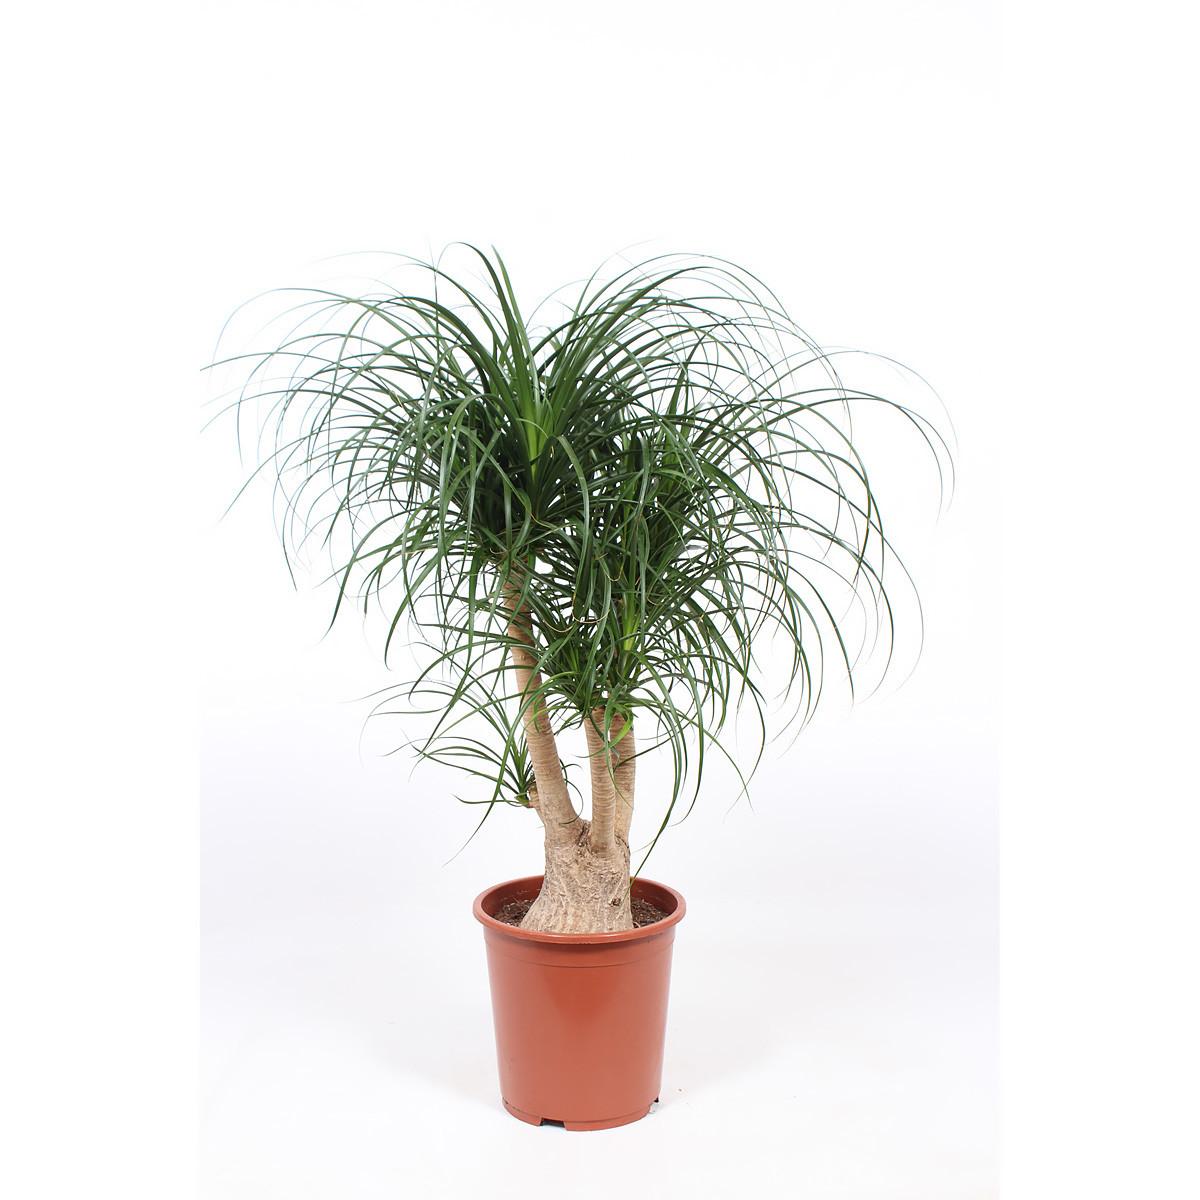 Beaucarnea recurvata120 cm